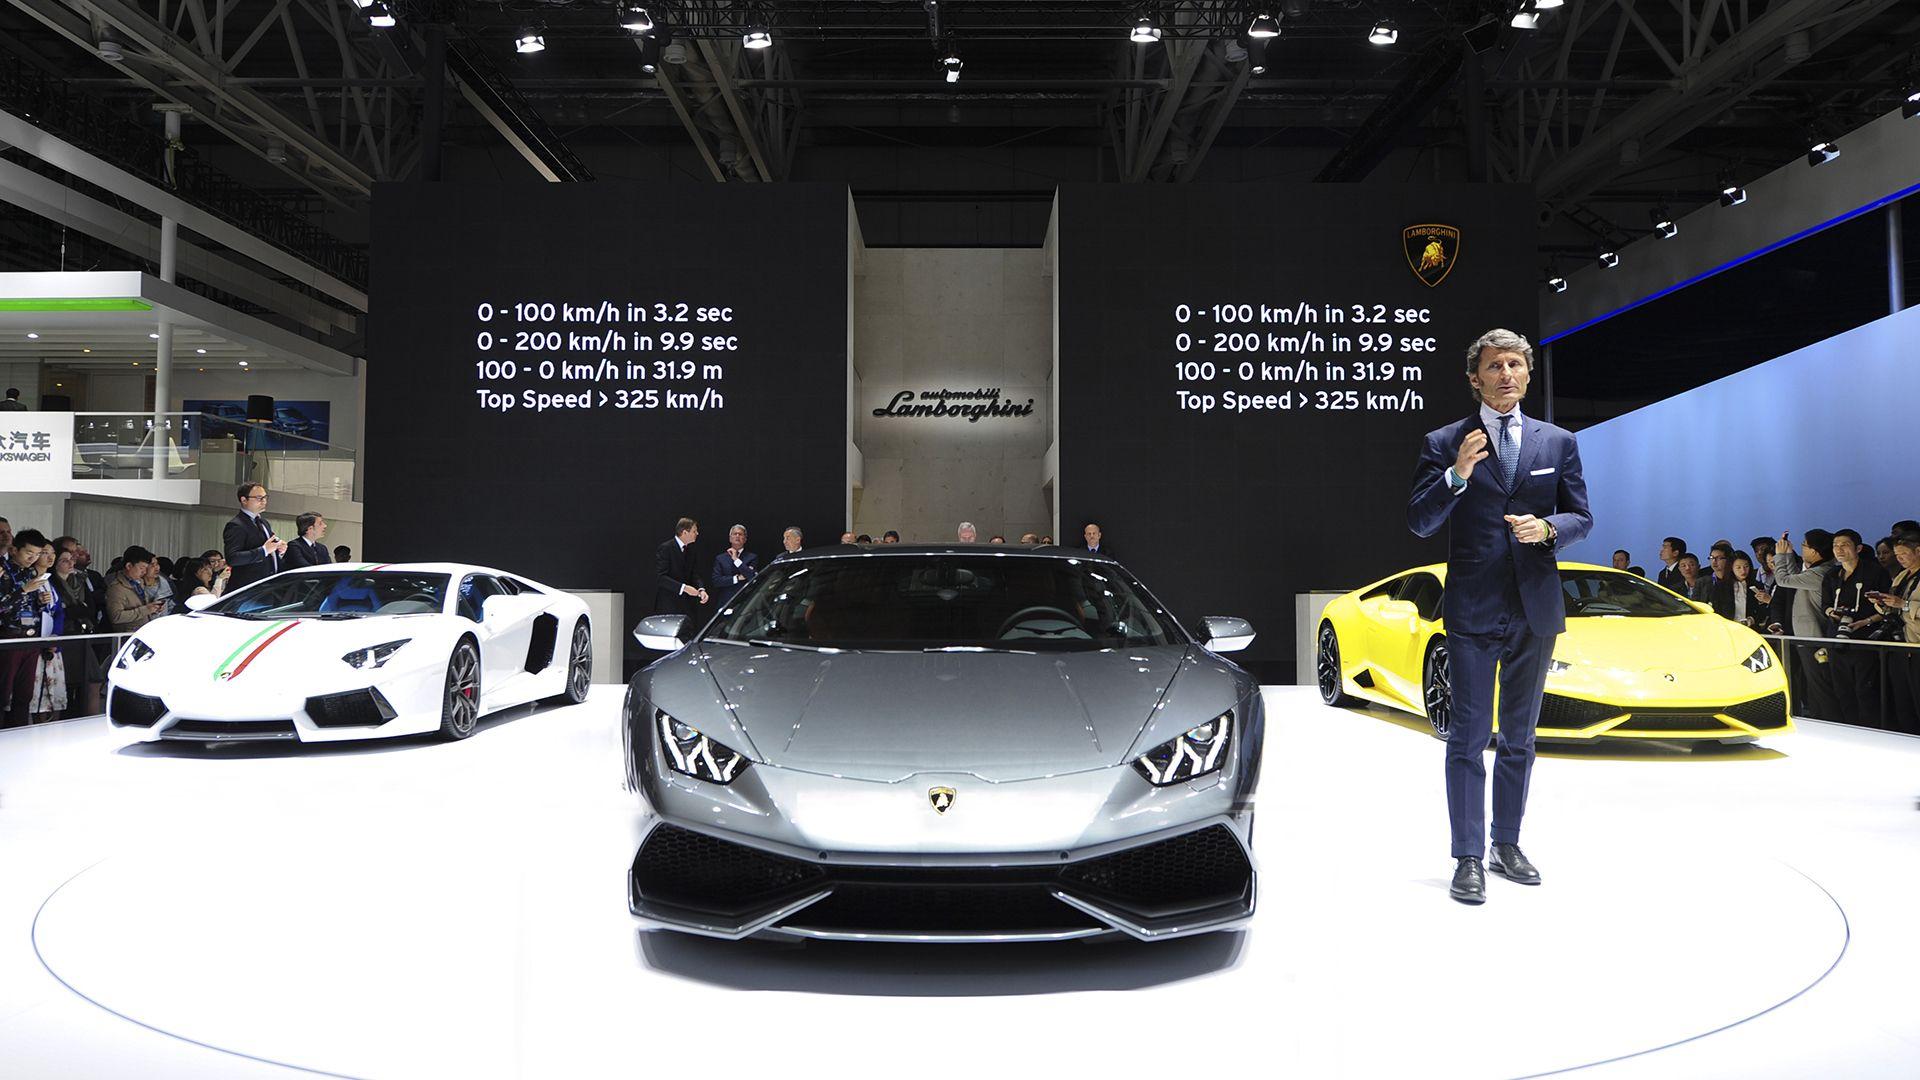 acabb0c26001bf7568abf05419518195 Marvelous Lamborghini Huracan Hack asphalt 8 Cars Trend